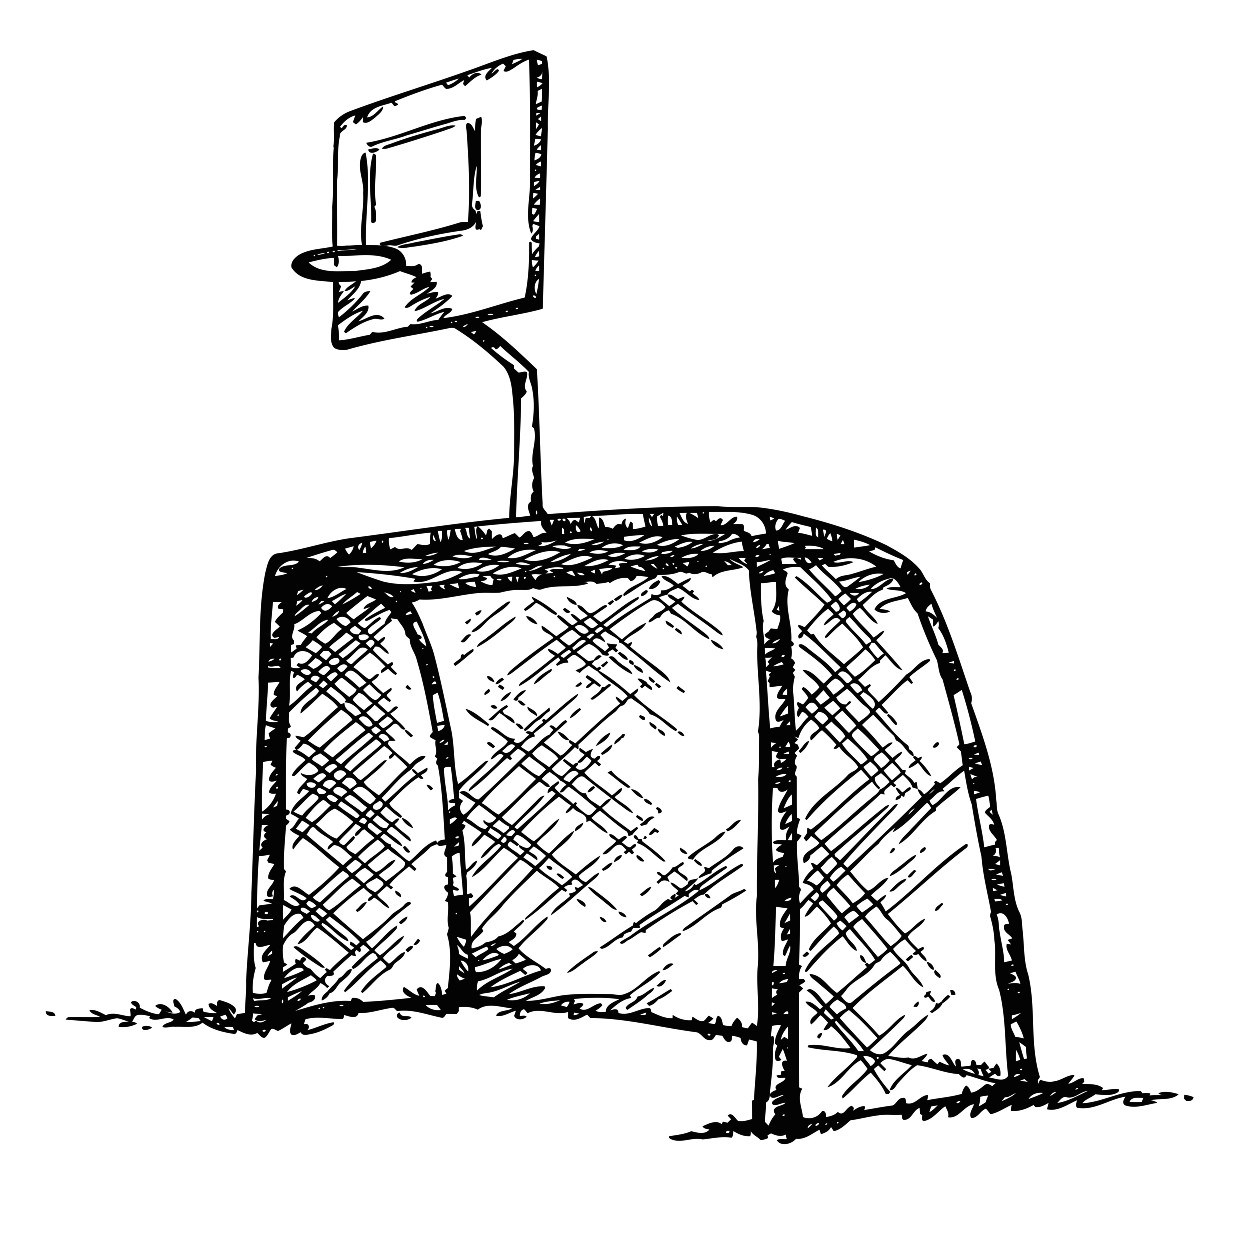 1235x1235 Two Basketball Players Printable Image Illustration Sketch For Two